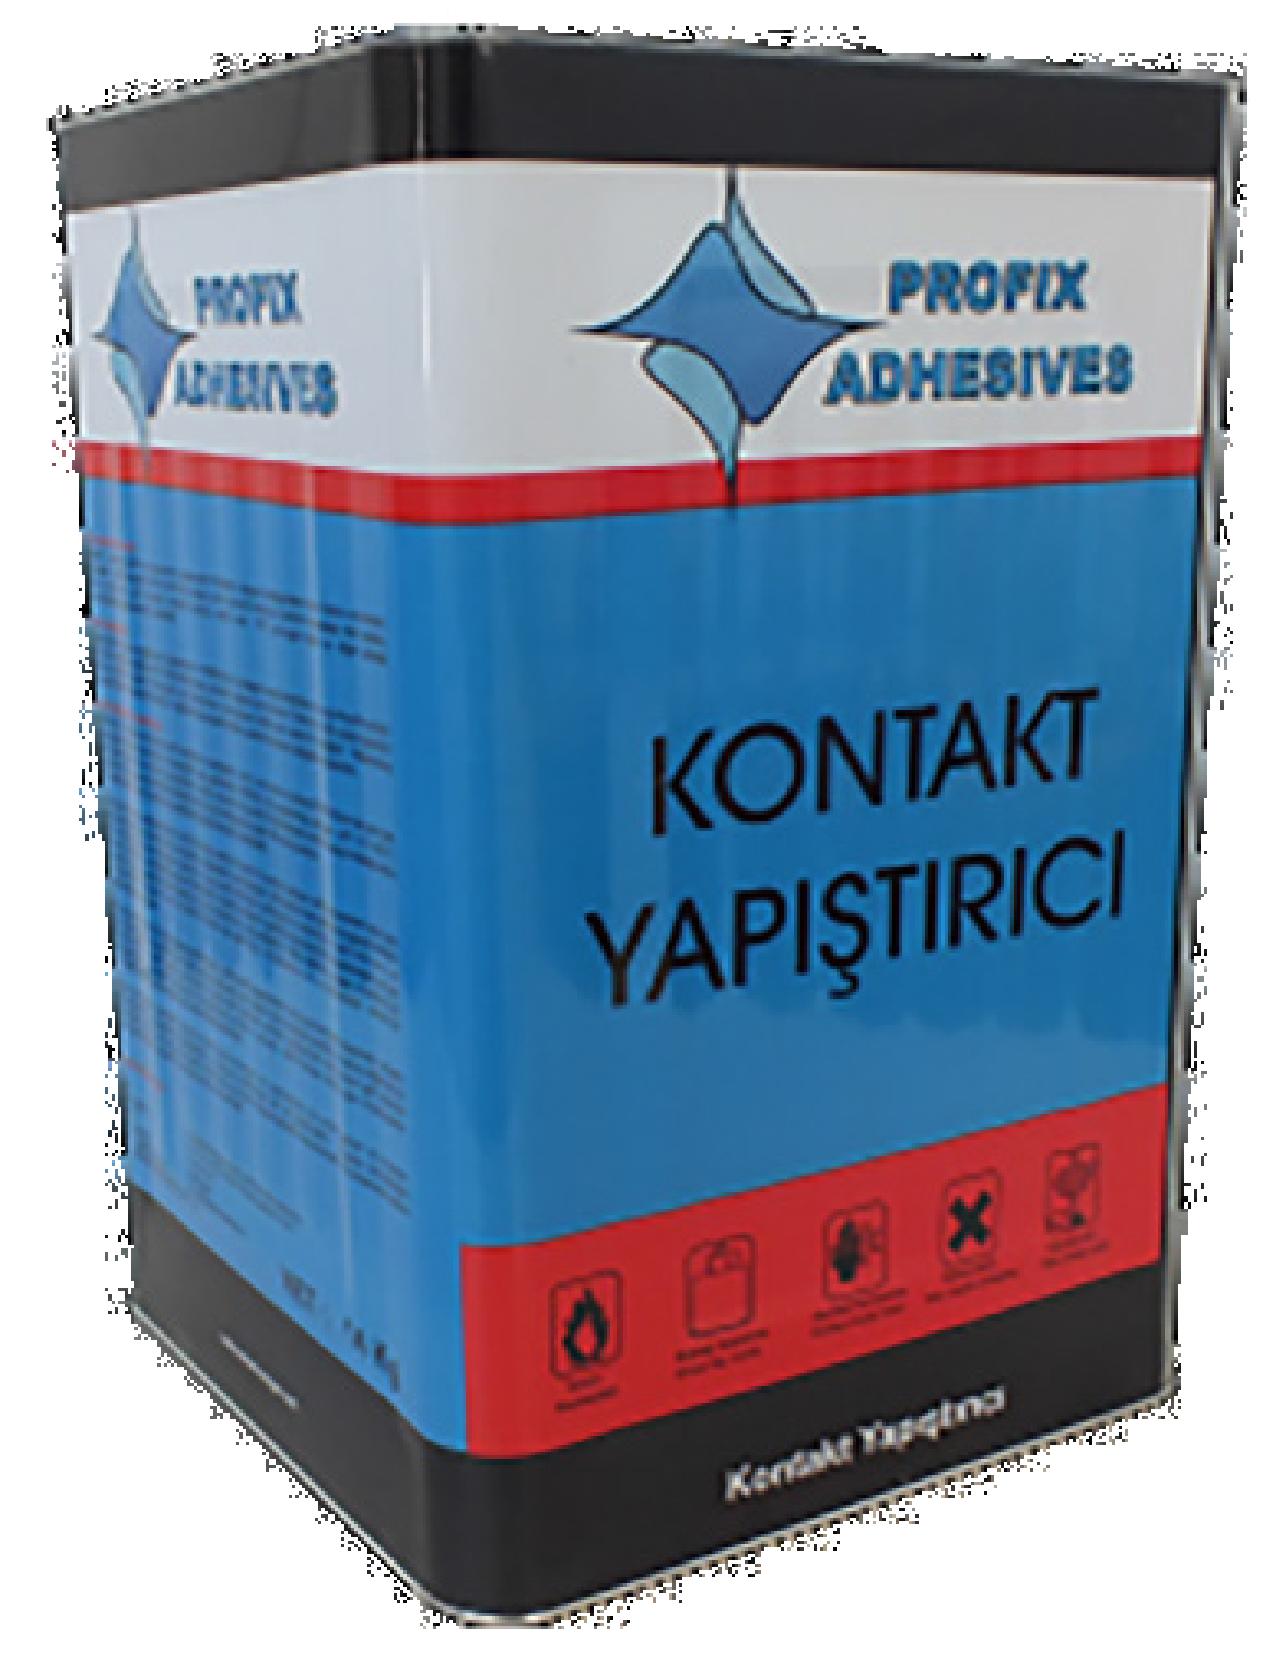 PROFIX® - Eksen Acoustical Foam